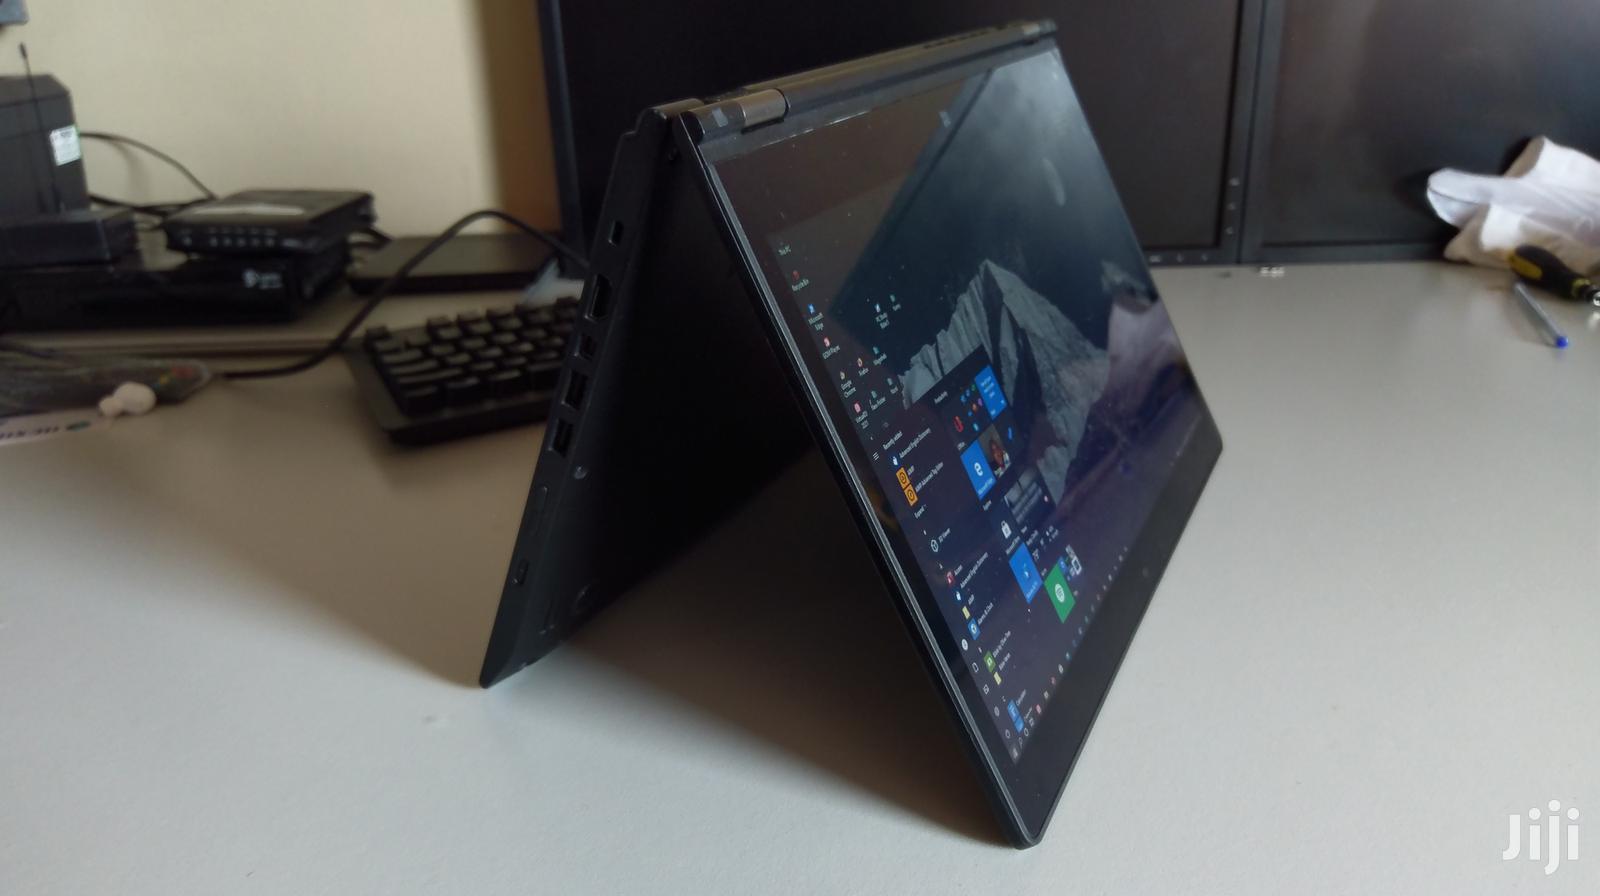 Laptop Lenovo ThinkPad Yoga 8GB Intel Core i5 SSD 256GB | Laptops & Computers for sale in Sunyani Municipal, Brong Ahafo, Ghana